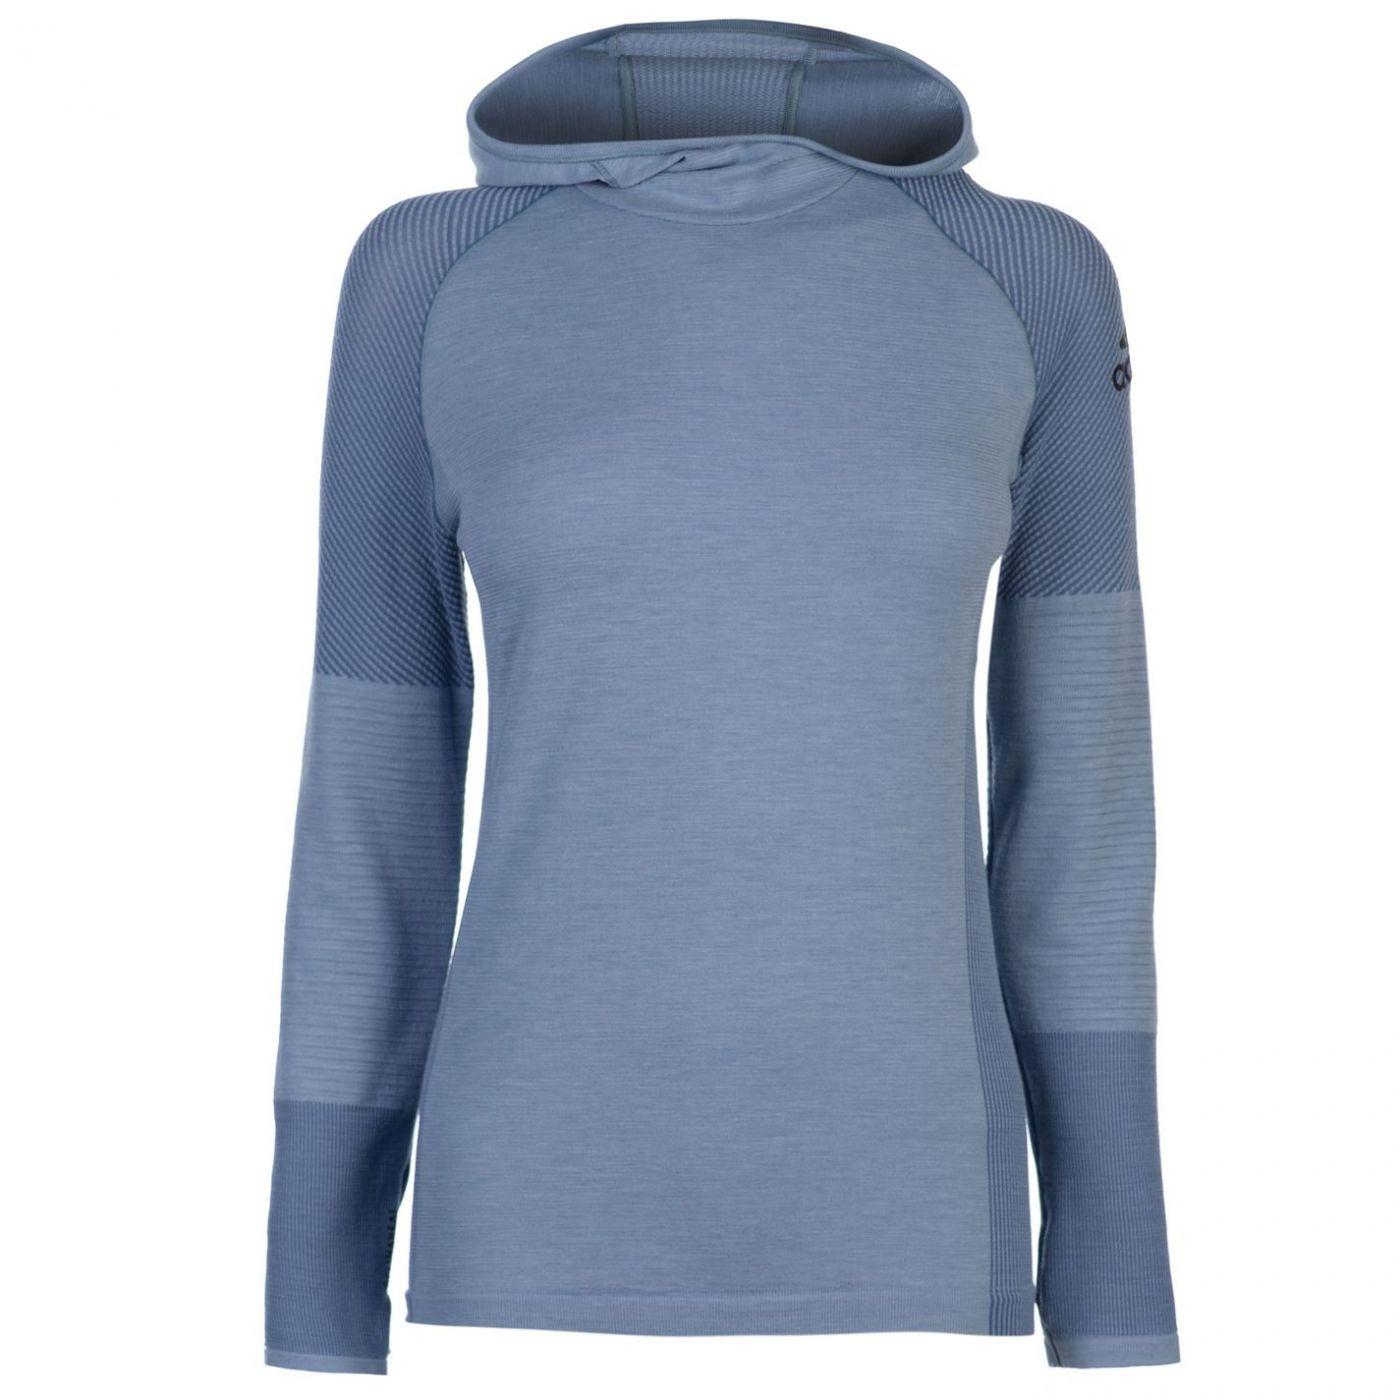 Adidas ClimaHeat Long Sleeve Hooded Top Ladies